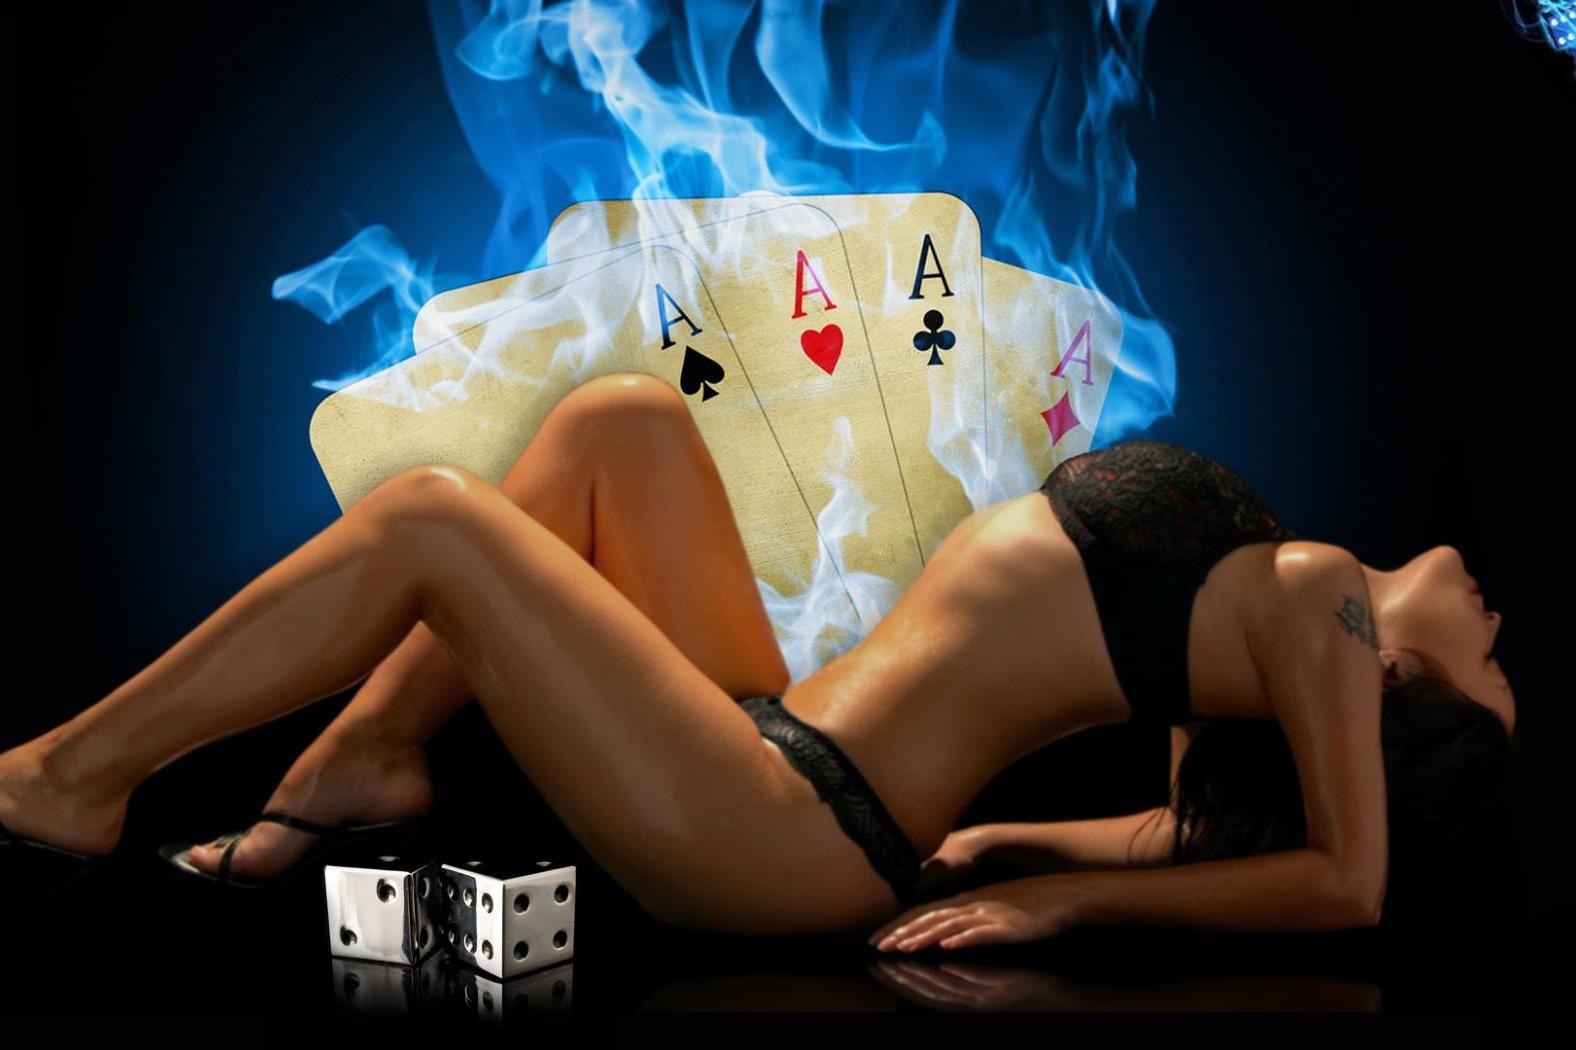 Texas holdem poker hack chips generator 6.2